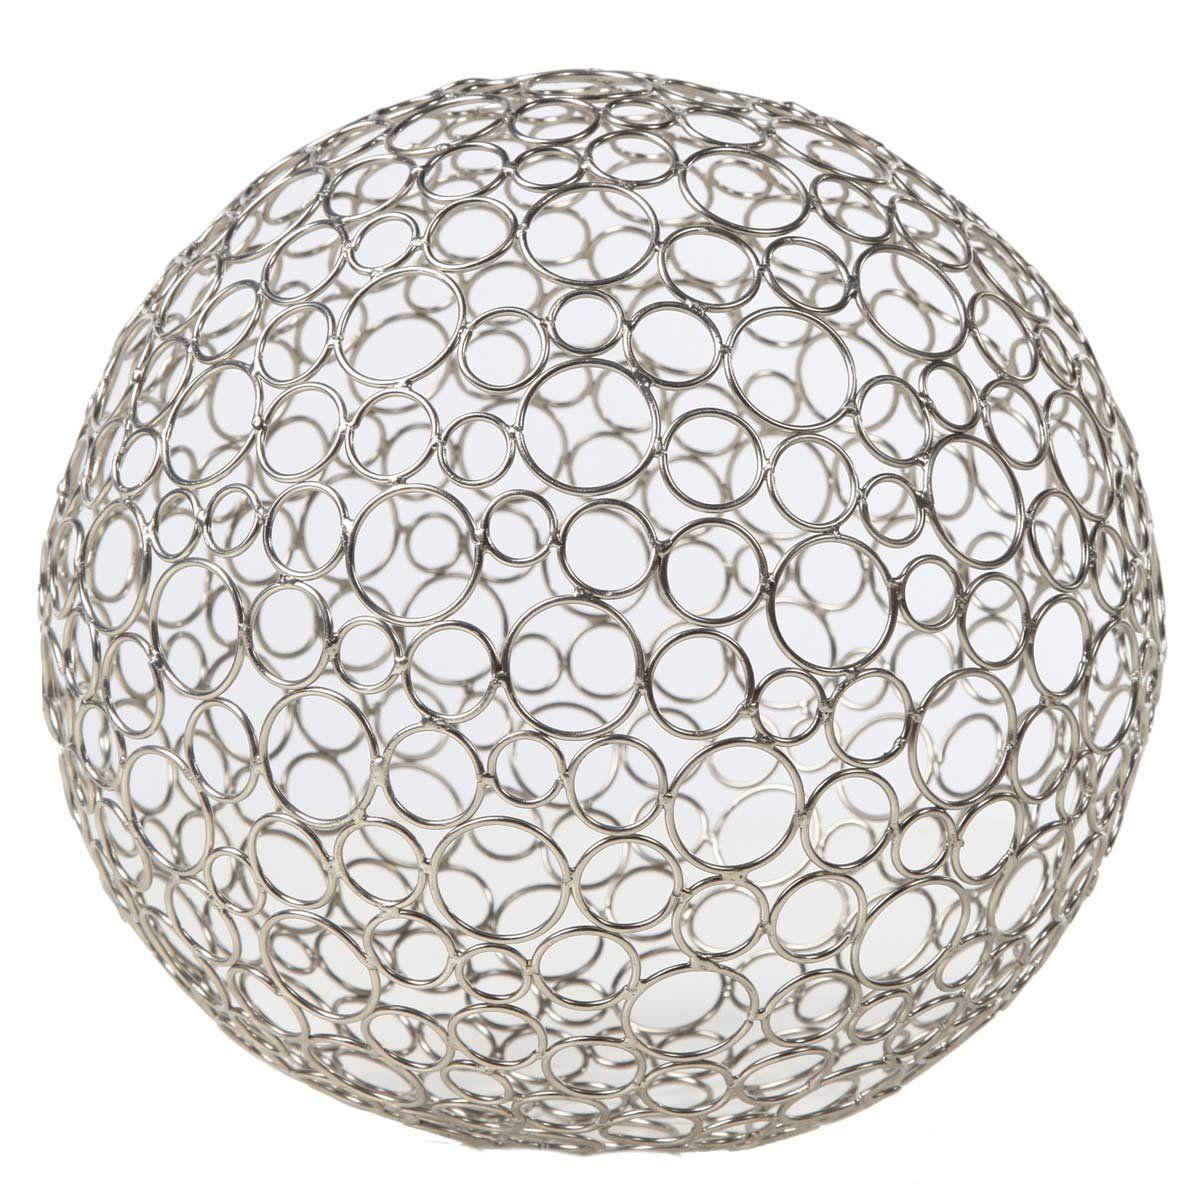 Silver Decorative Balls Amazon  Gold Leaf Design Group 3803423 Metal Circle